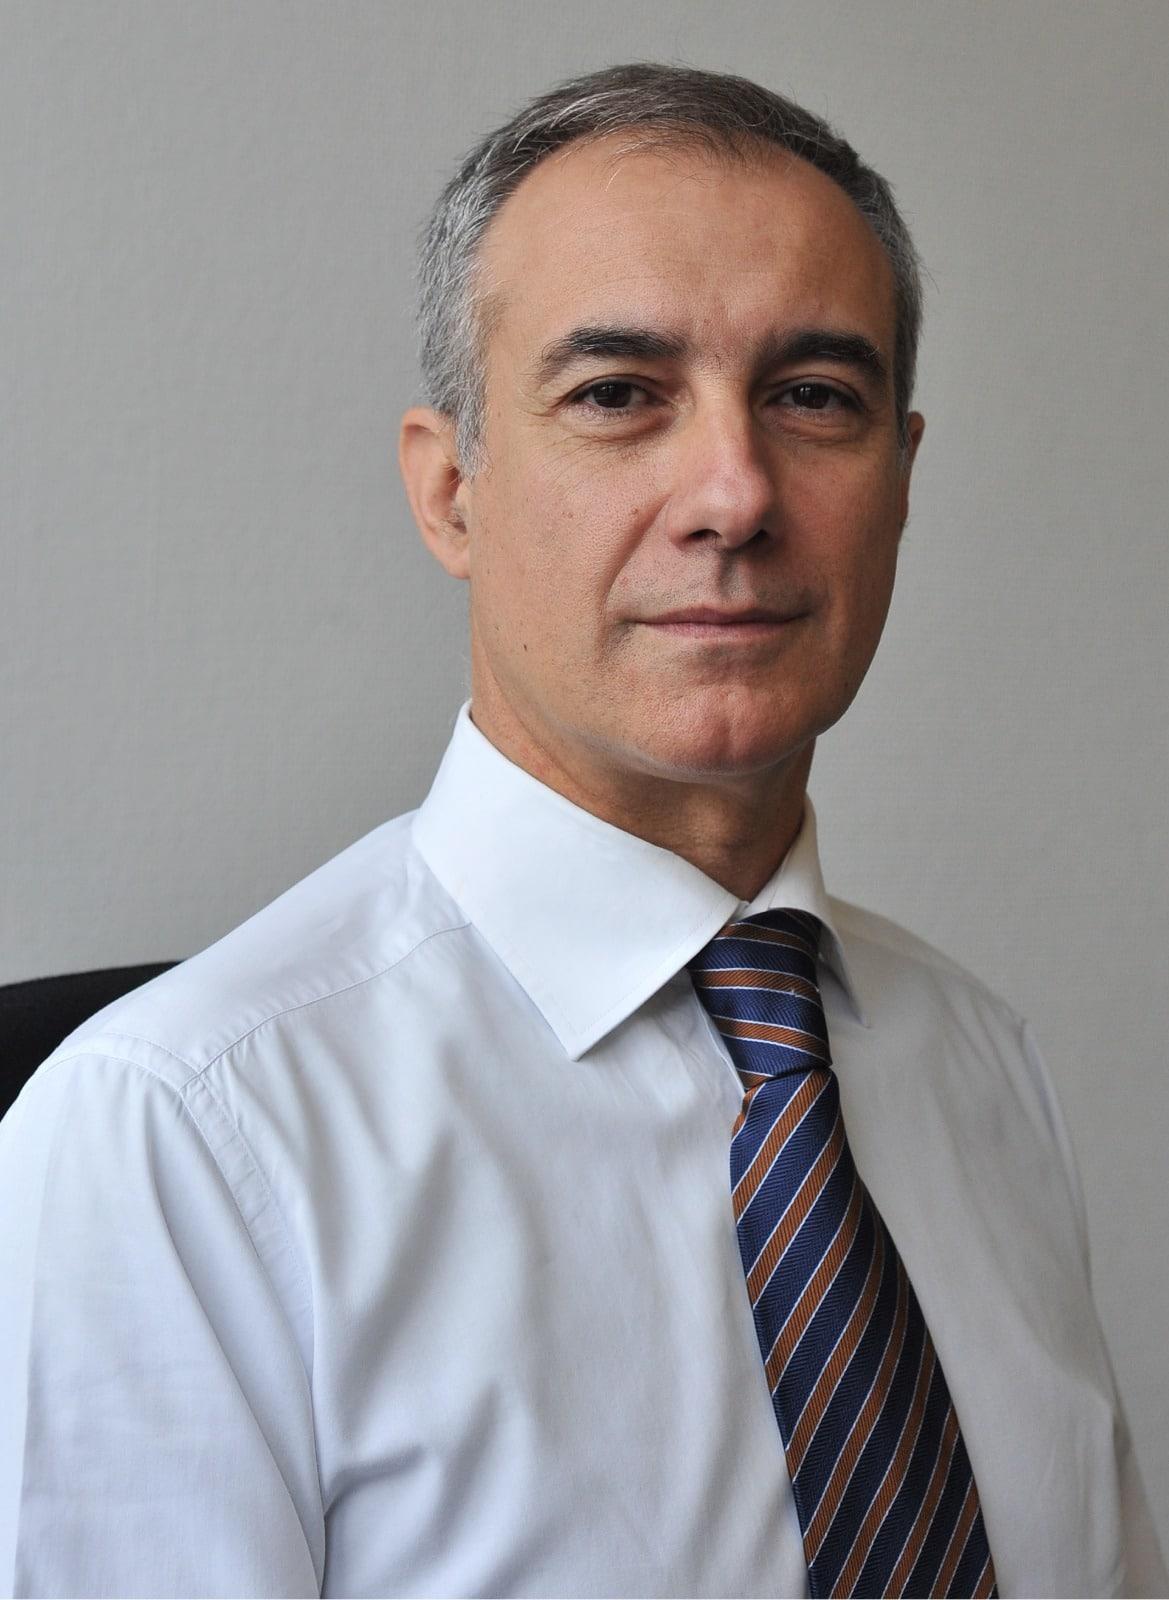 Marco Testa